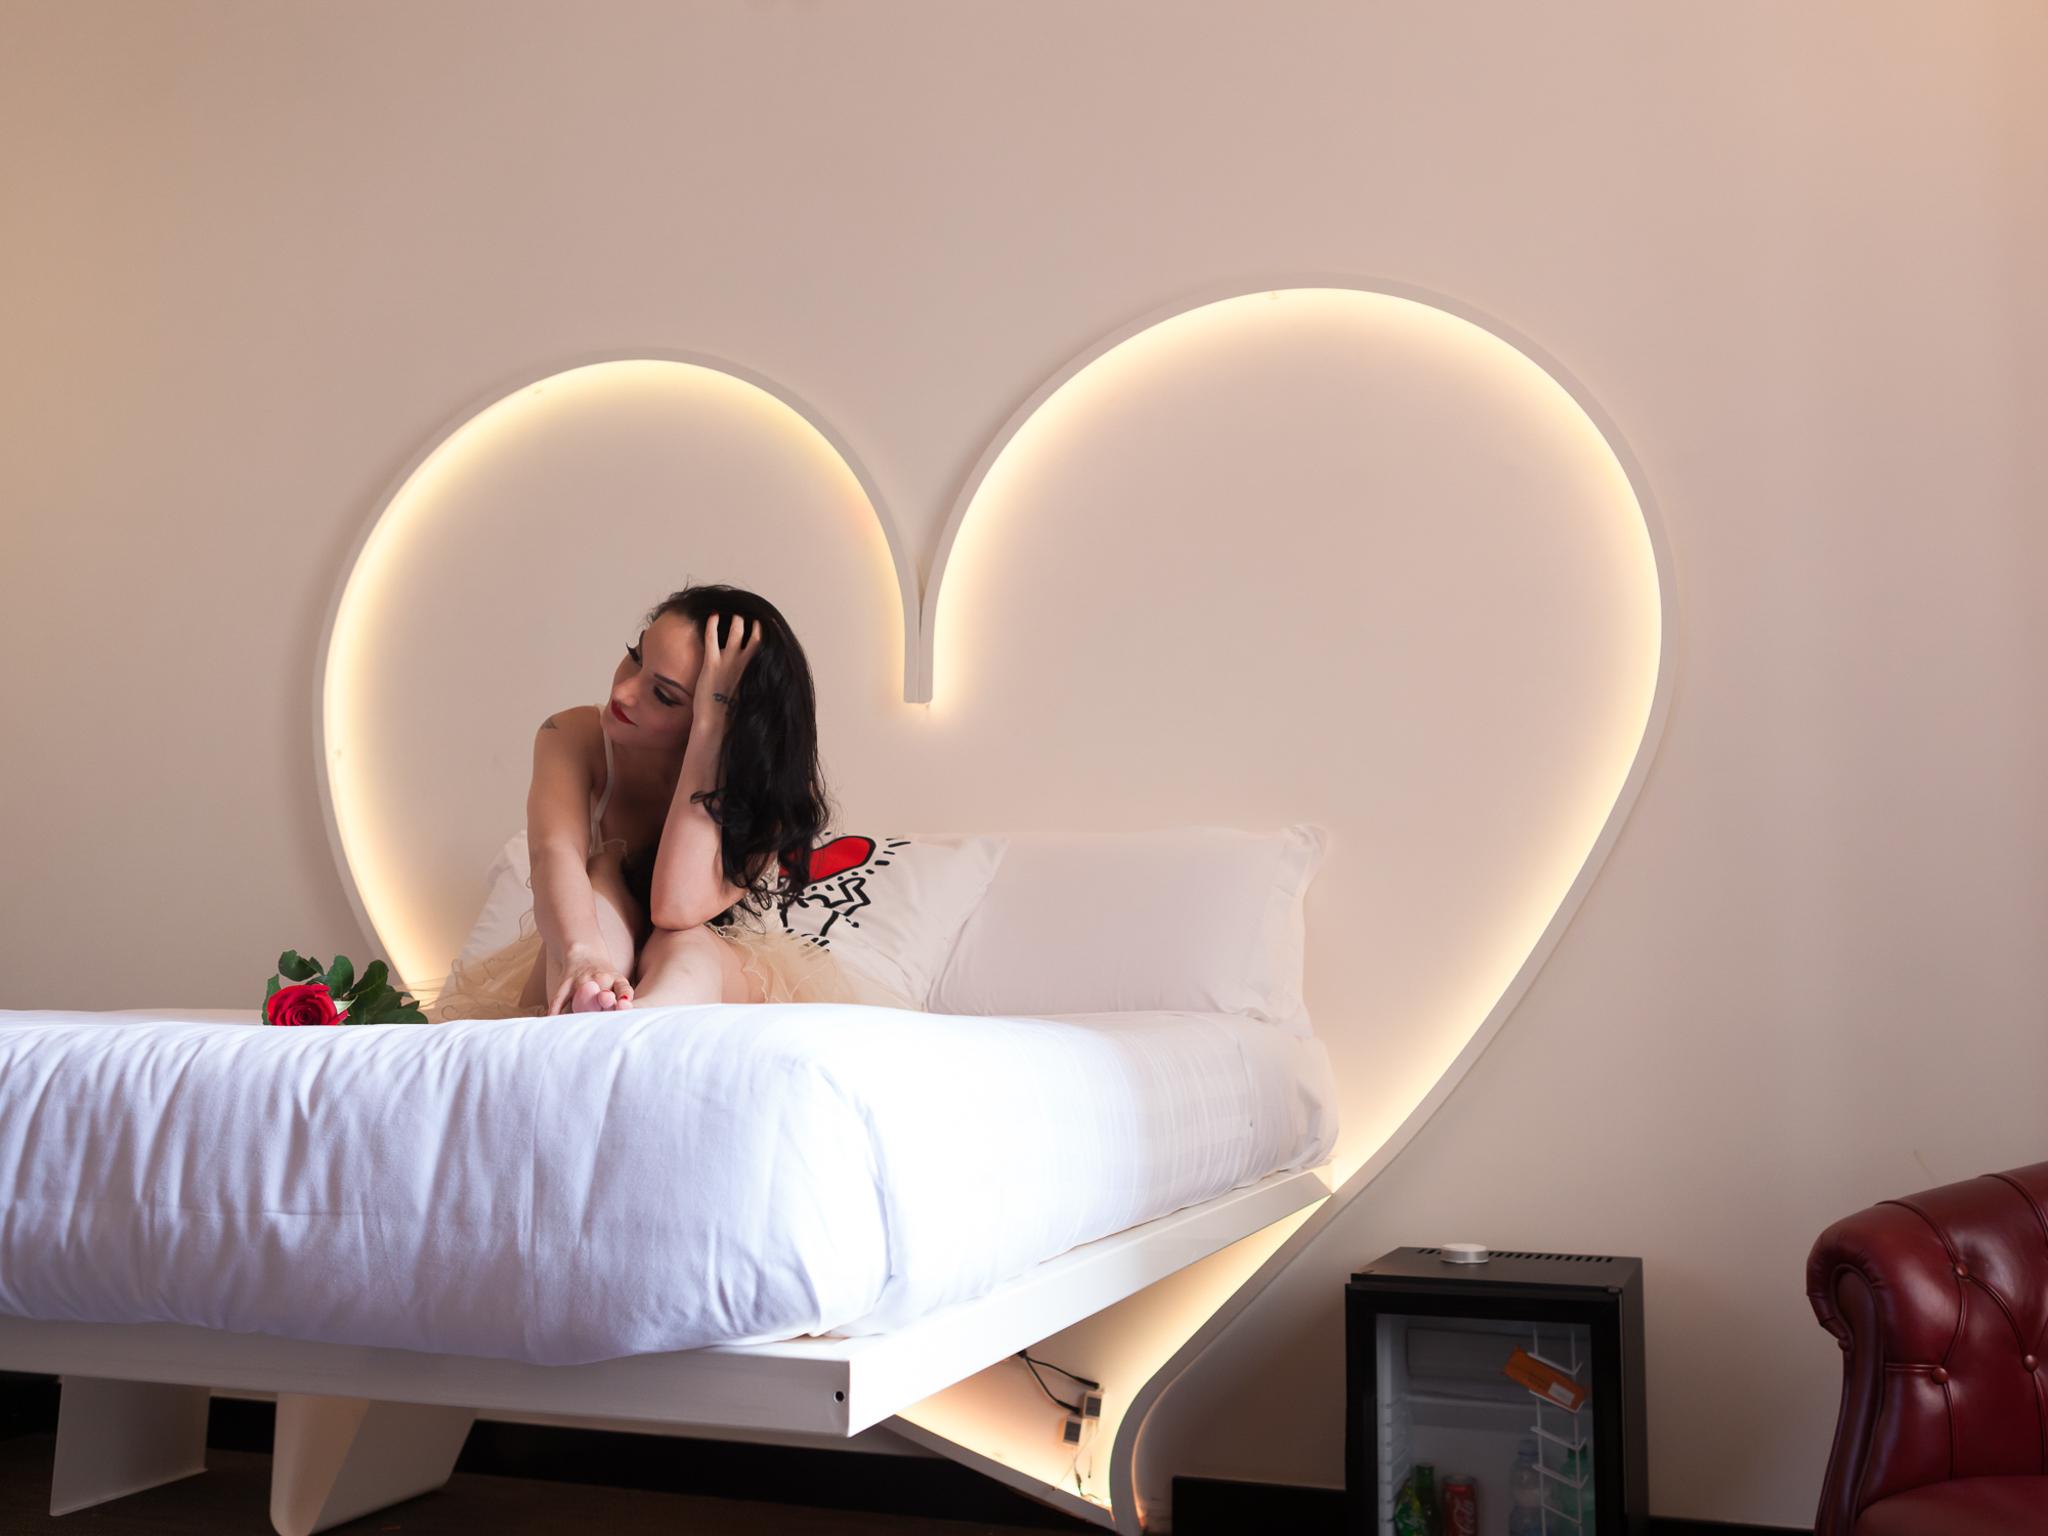 Romantic Setting in room